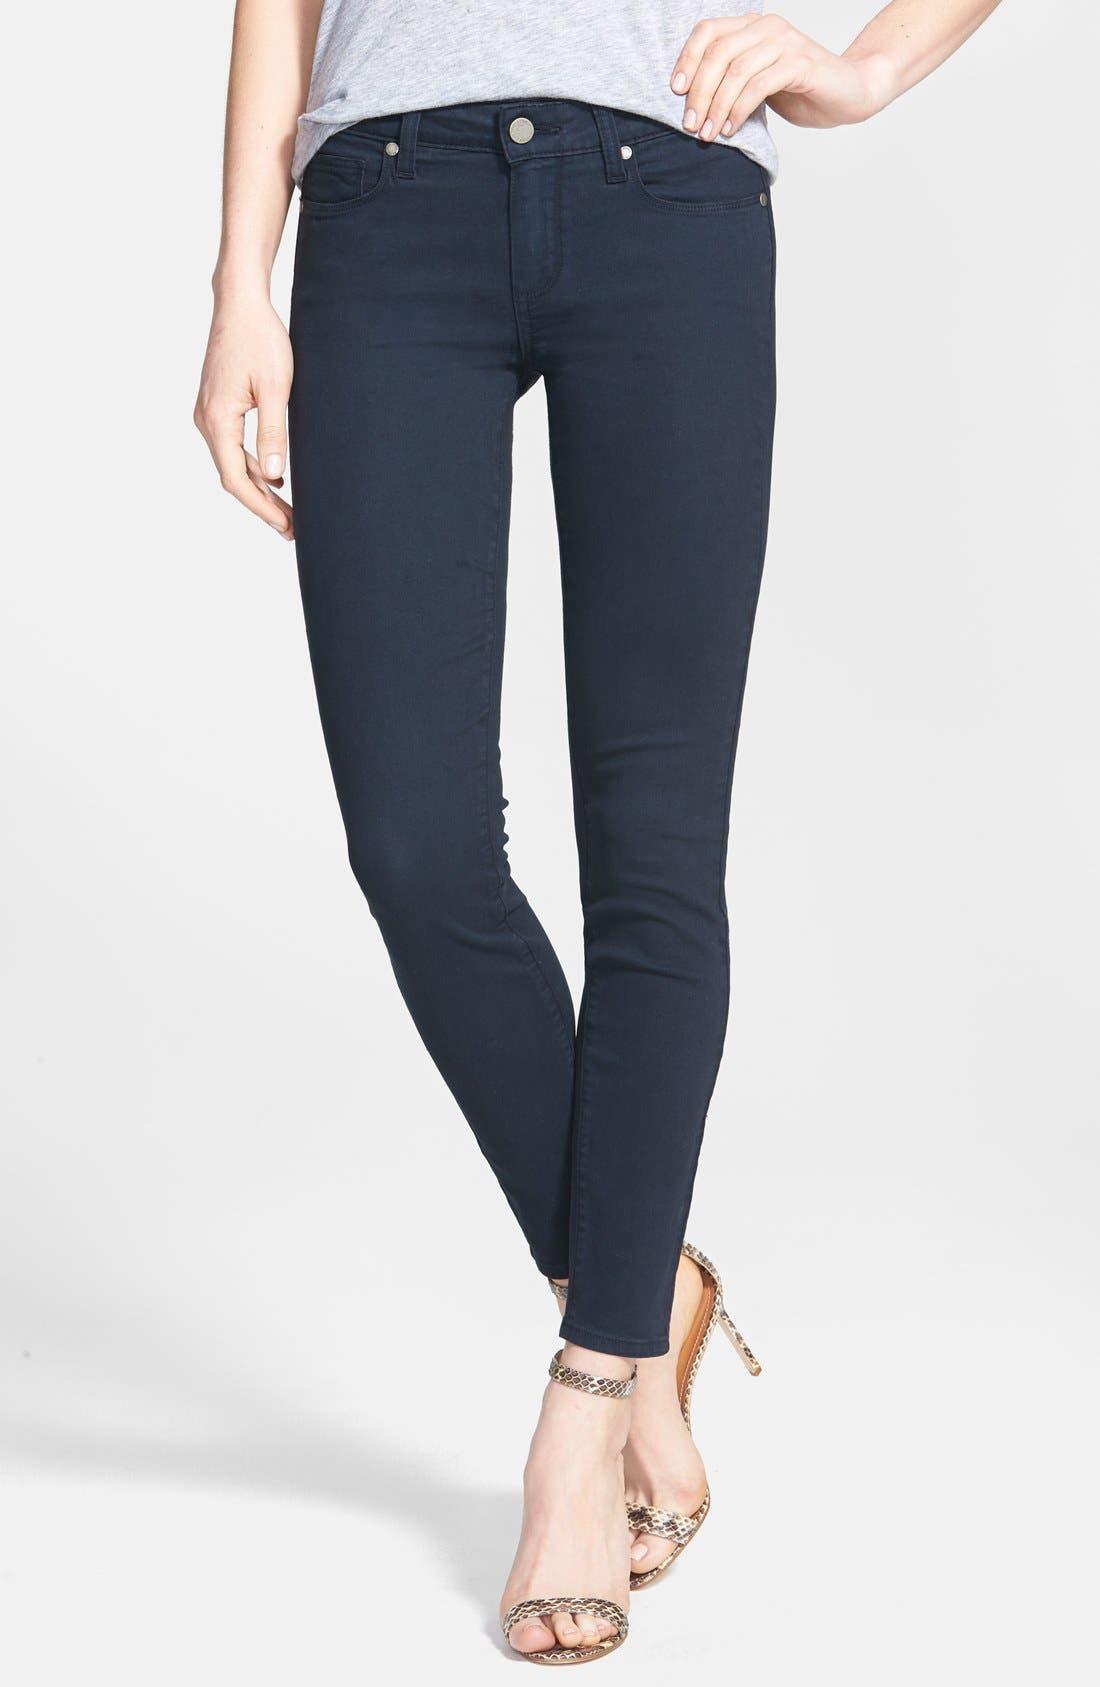 Alternate Image 1 Selected - Paige Denim 'Verdugo' Skinny Ankle Jeans (Azure)